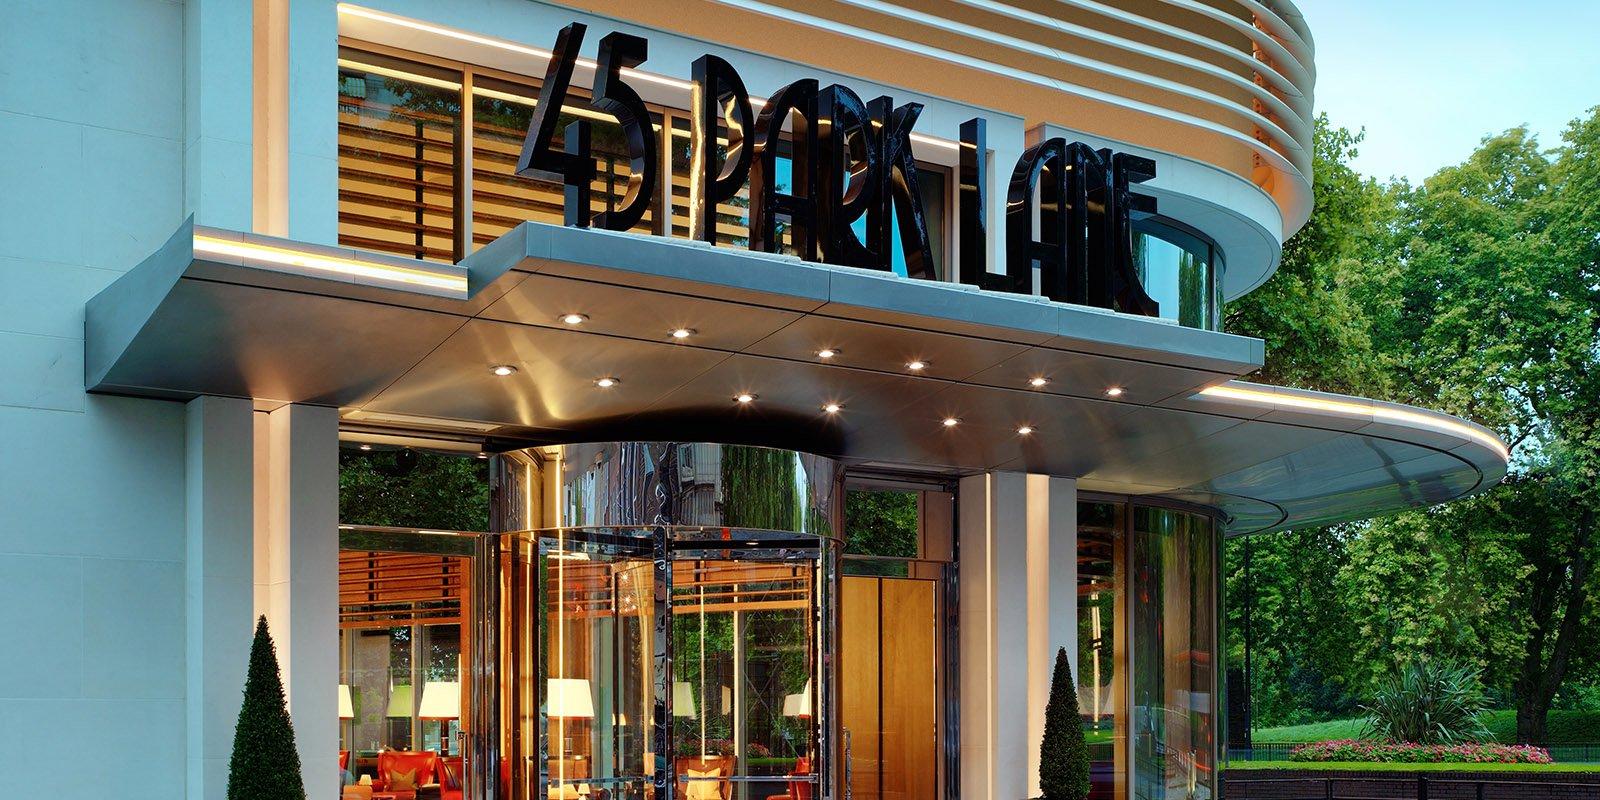 45-Park-Lane-hotel-events-and-wedding-venue.jpg